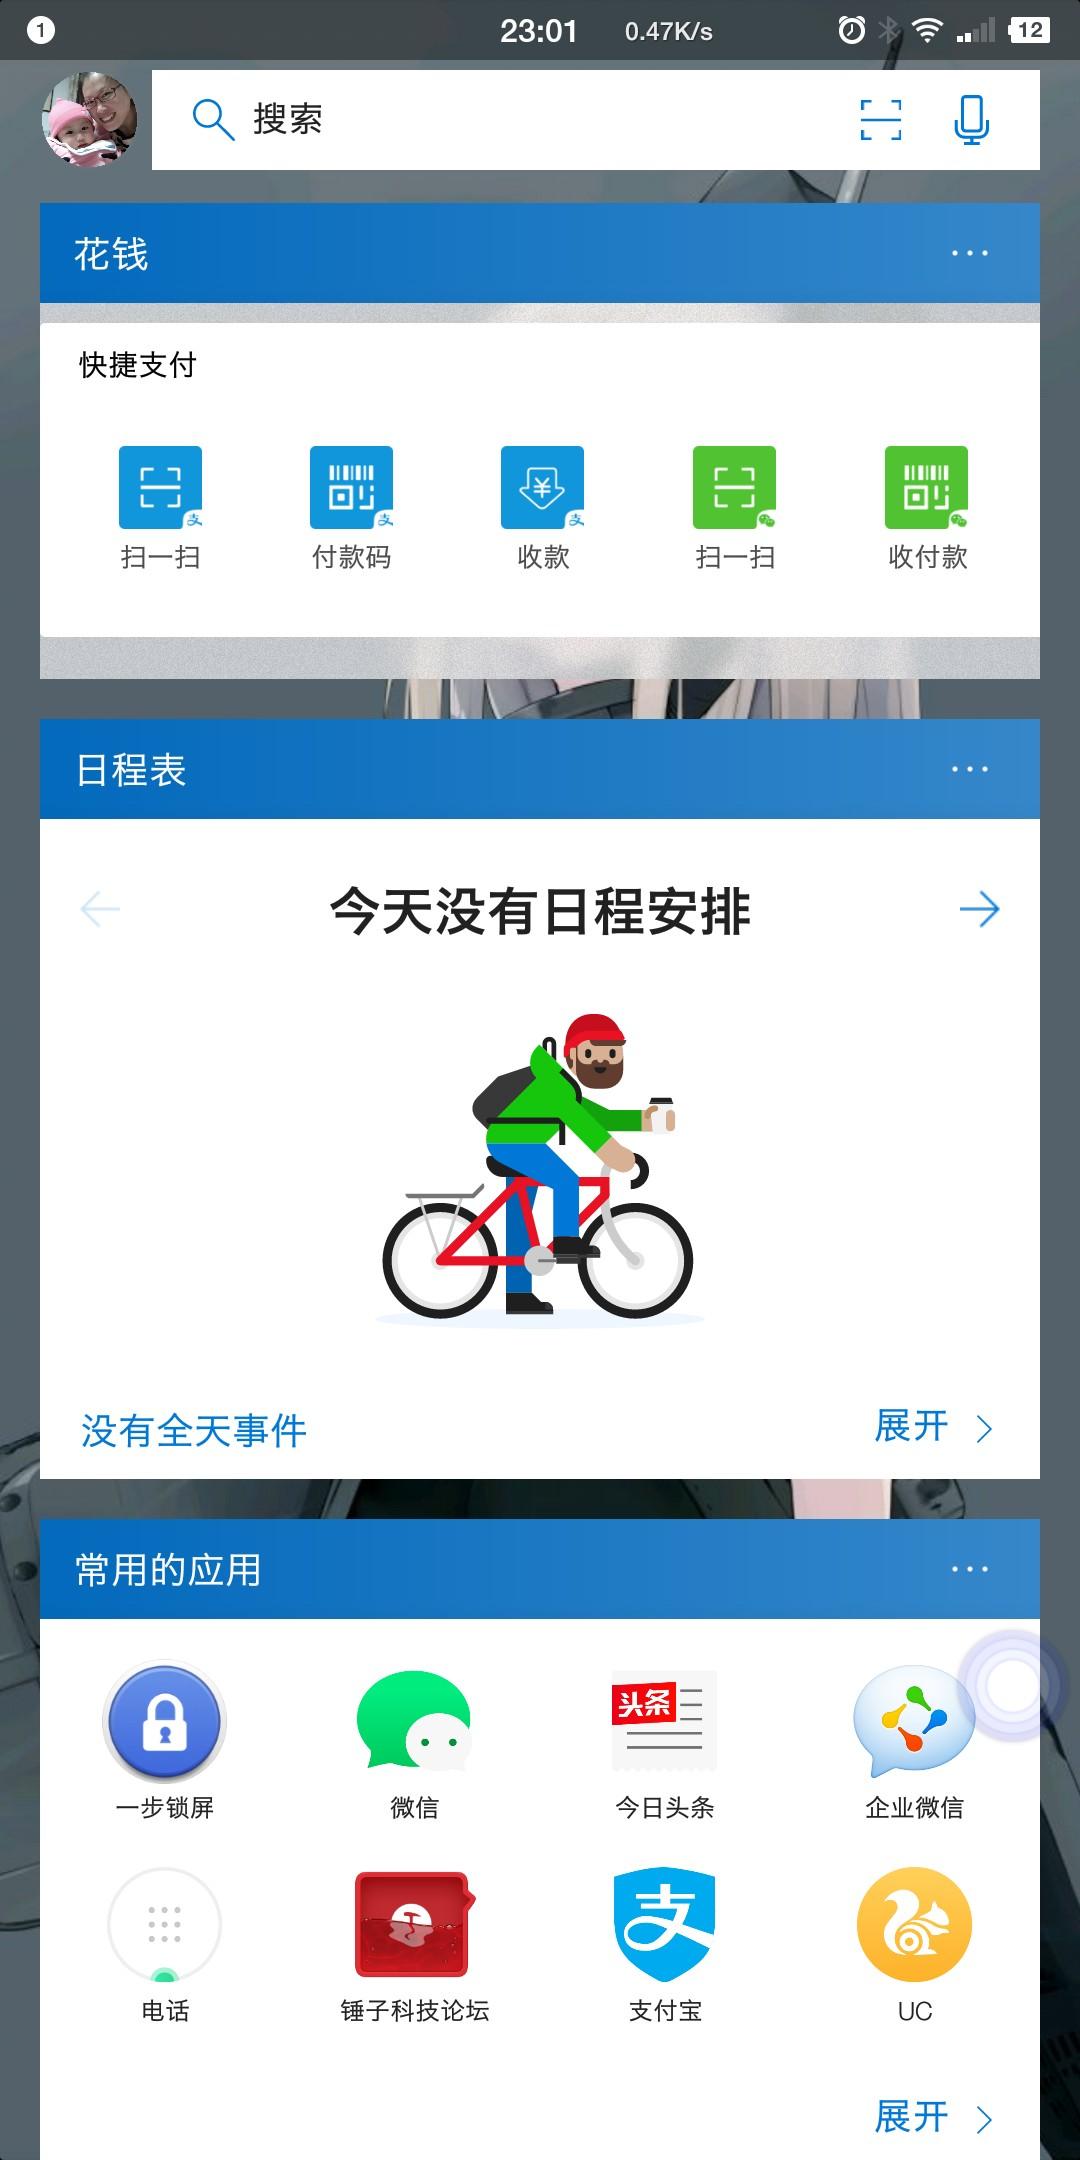 Screenshot_2018-01-13-23-01-53-750_????.png